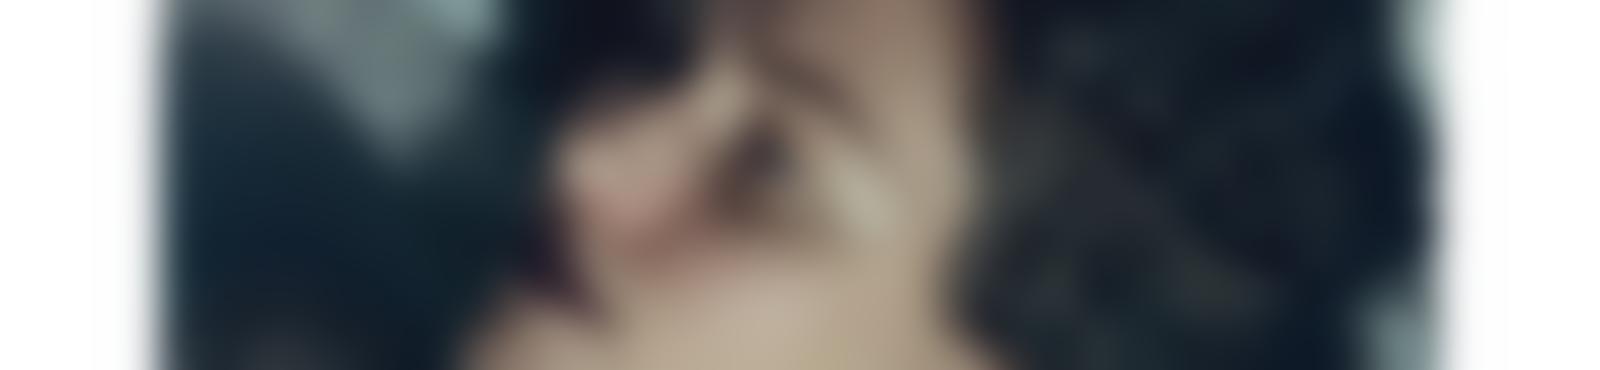 Blurred 31bc27f0 acdf 45c3 8c7a df8b84350a37